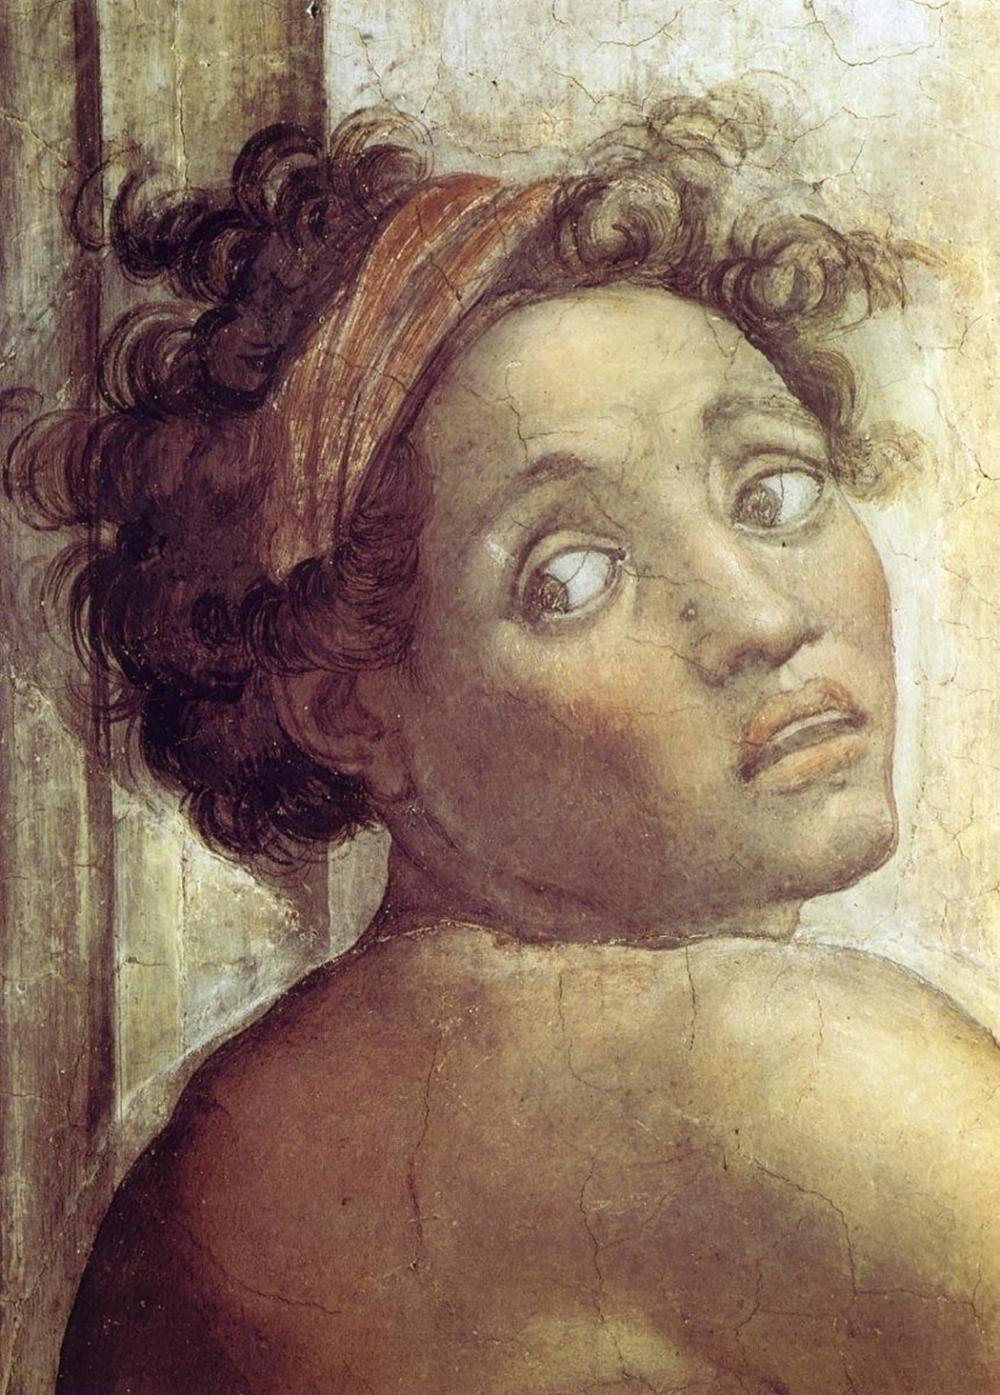 MICHELANGELO NUDE FIGURE NEXT TO THE SCENE OF NOAHS SACRIFICE DETAIL 1509